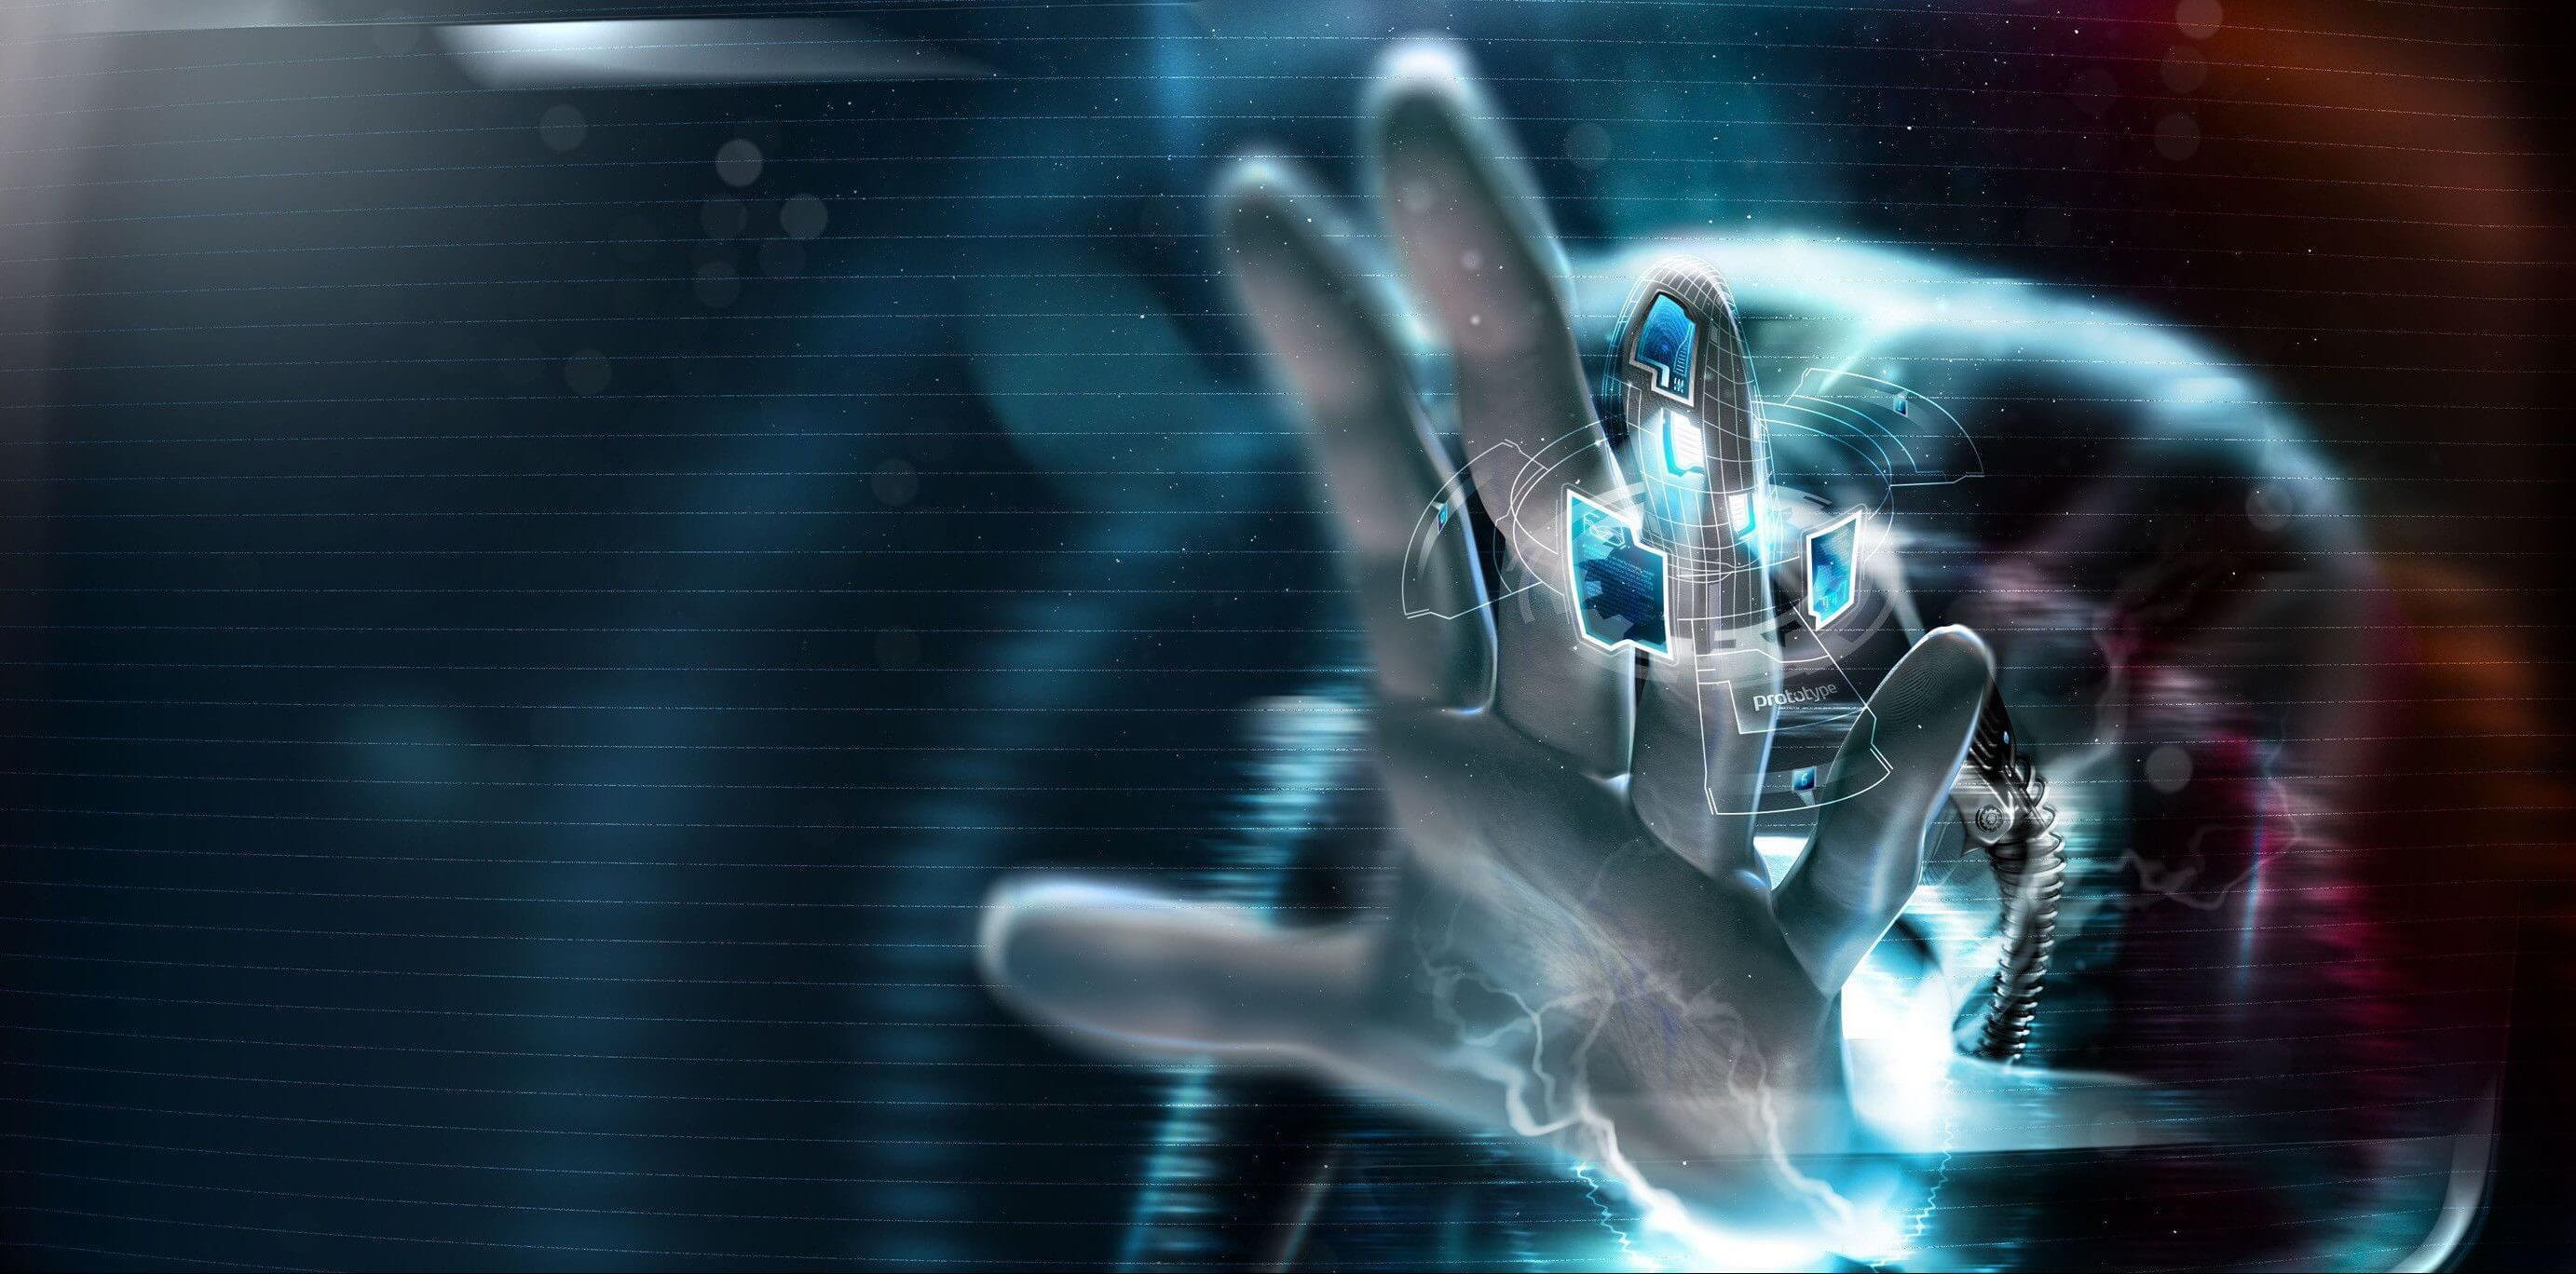 negocio_empreendimento_tecnologia_Biometria_processo_cadastro_registro_hacker_backup_digital_firewall_virus_rootkit_trojan_opcoes_seguranca_operacao_financeiro_fiscal_automacao_comercial_EPOC_OZTechnology